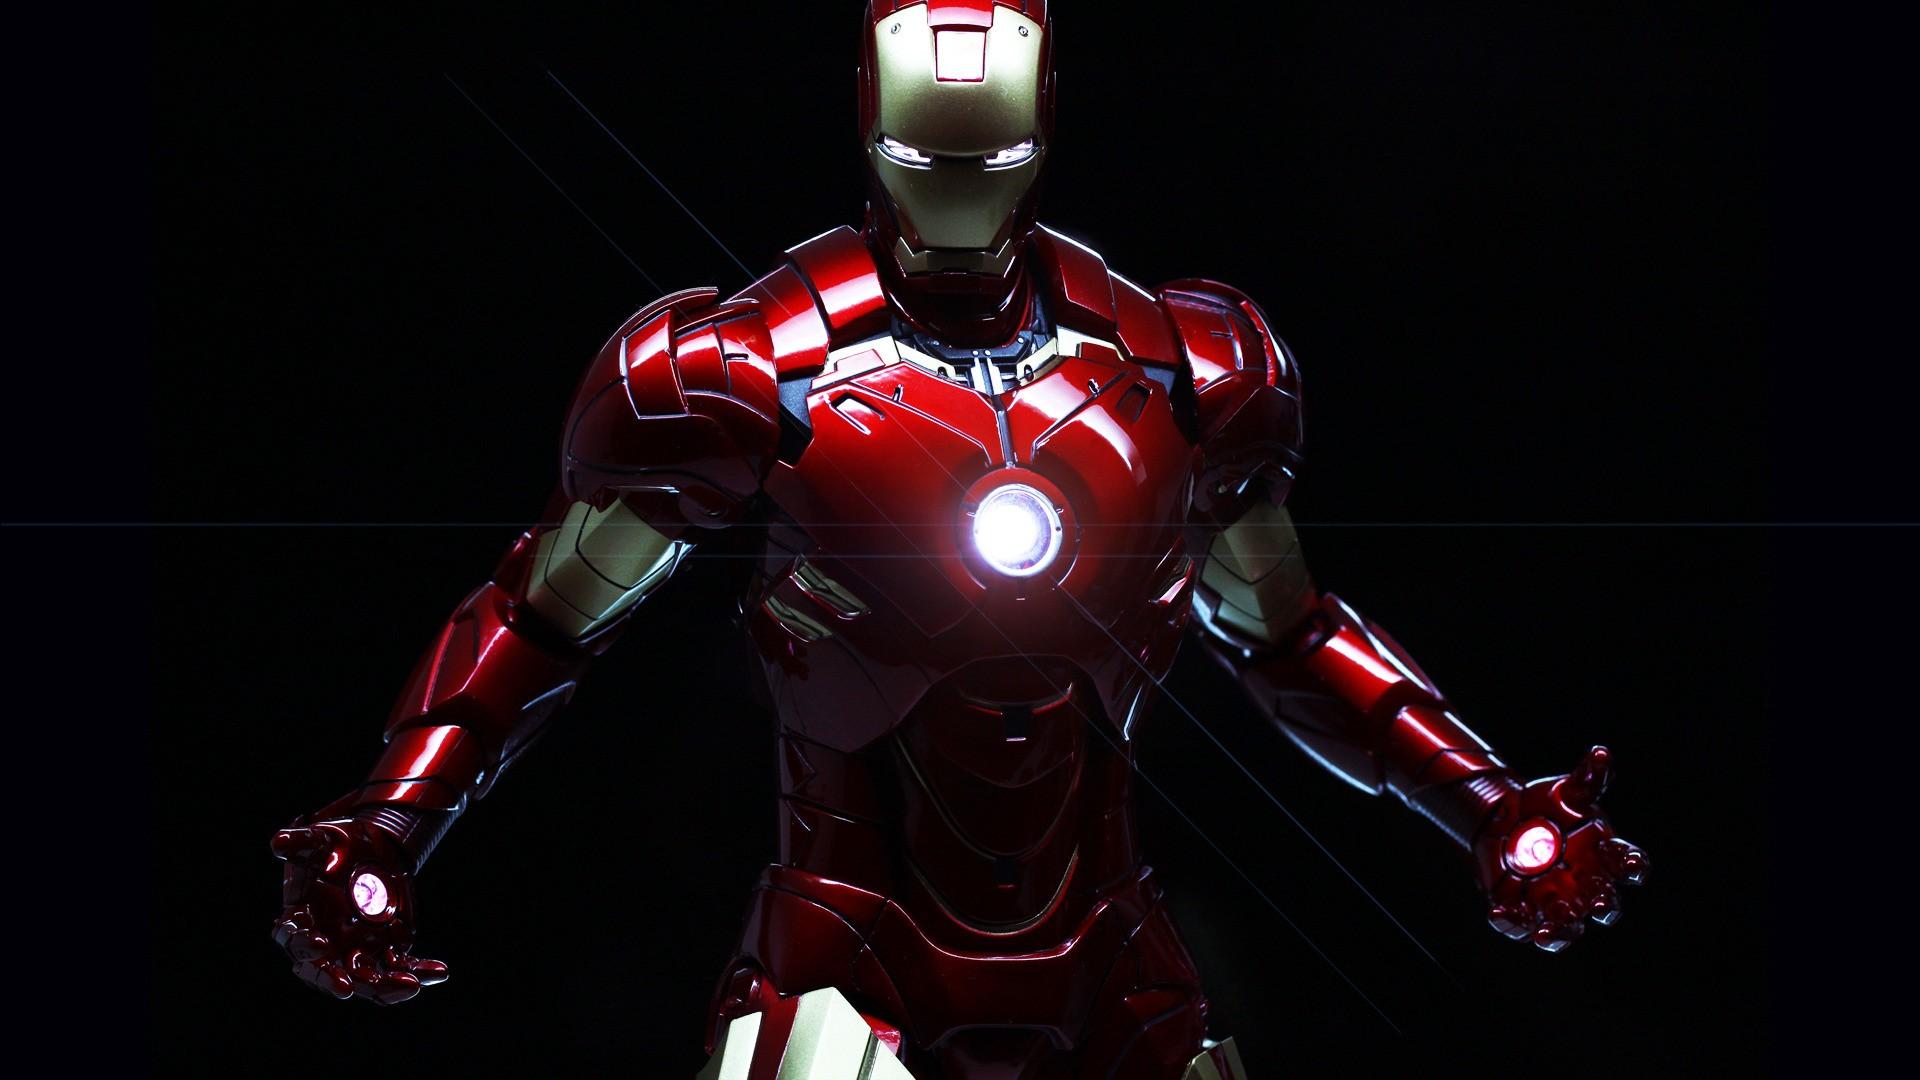 Superhero wallpaper hd wallpapersafari - Iron man cartoon hd ...